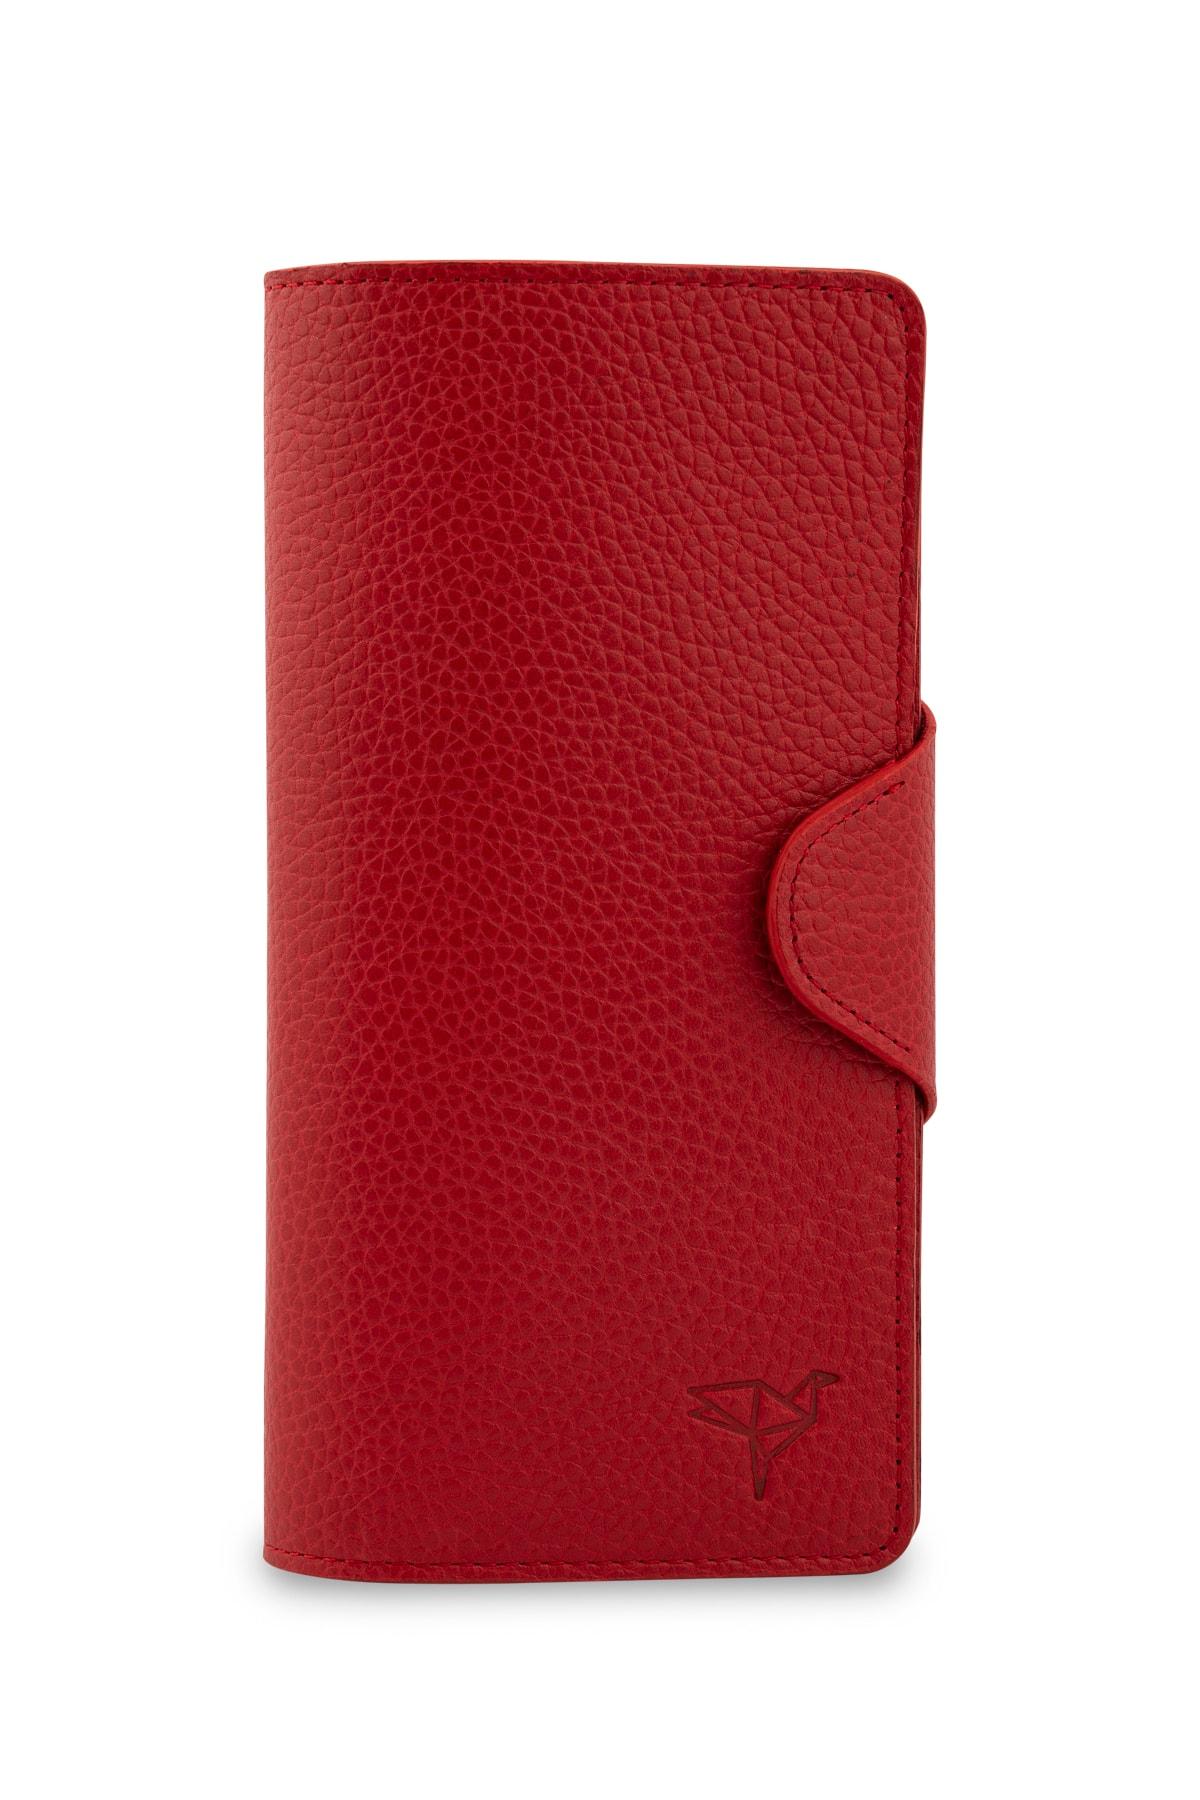 Garbalia Martha Hakiki Deri Kırmızı Unisex Portföy Cüzdan 1